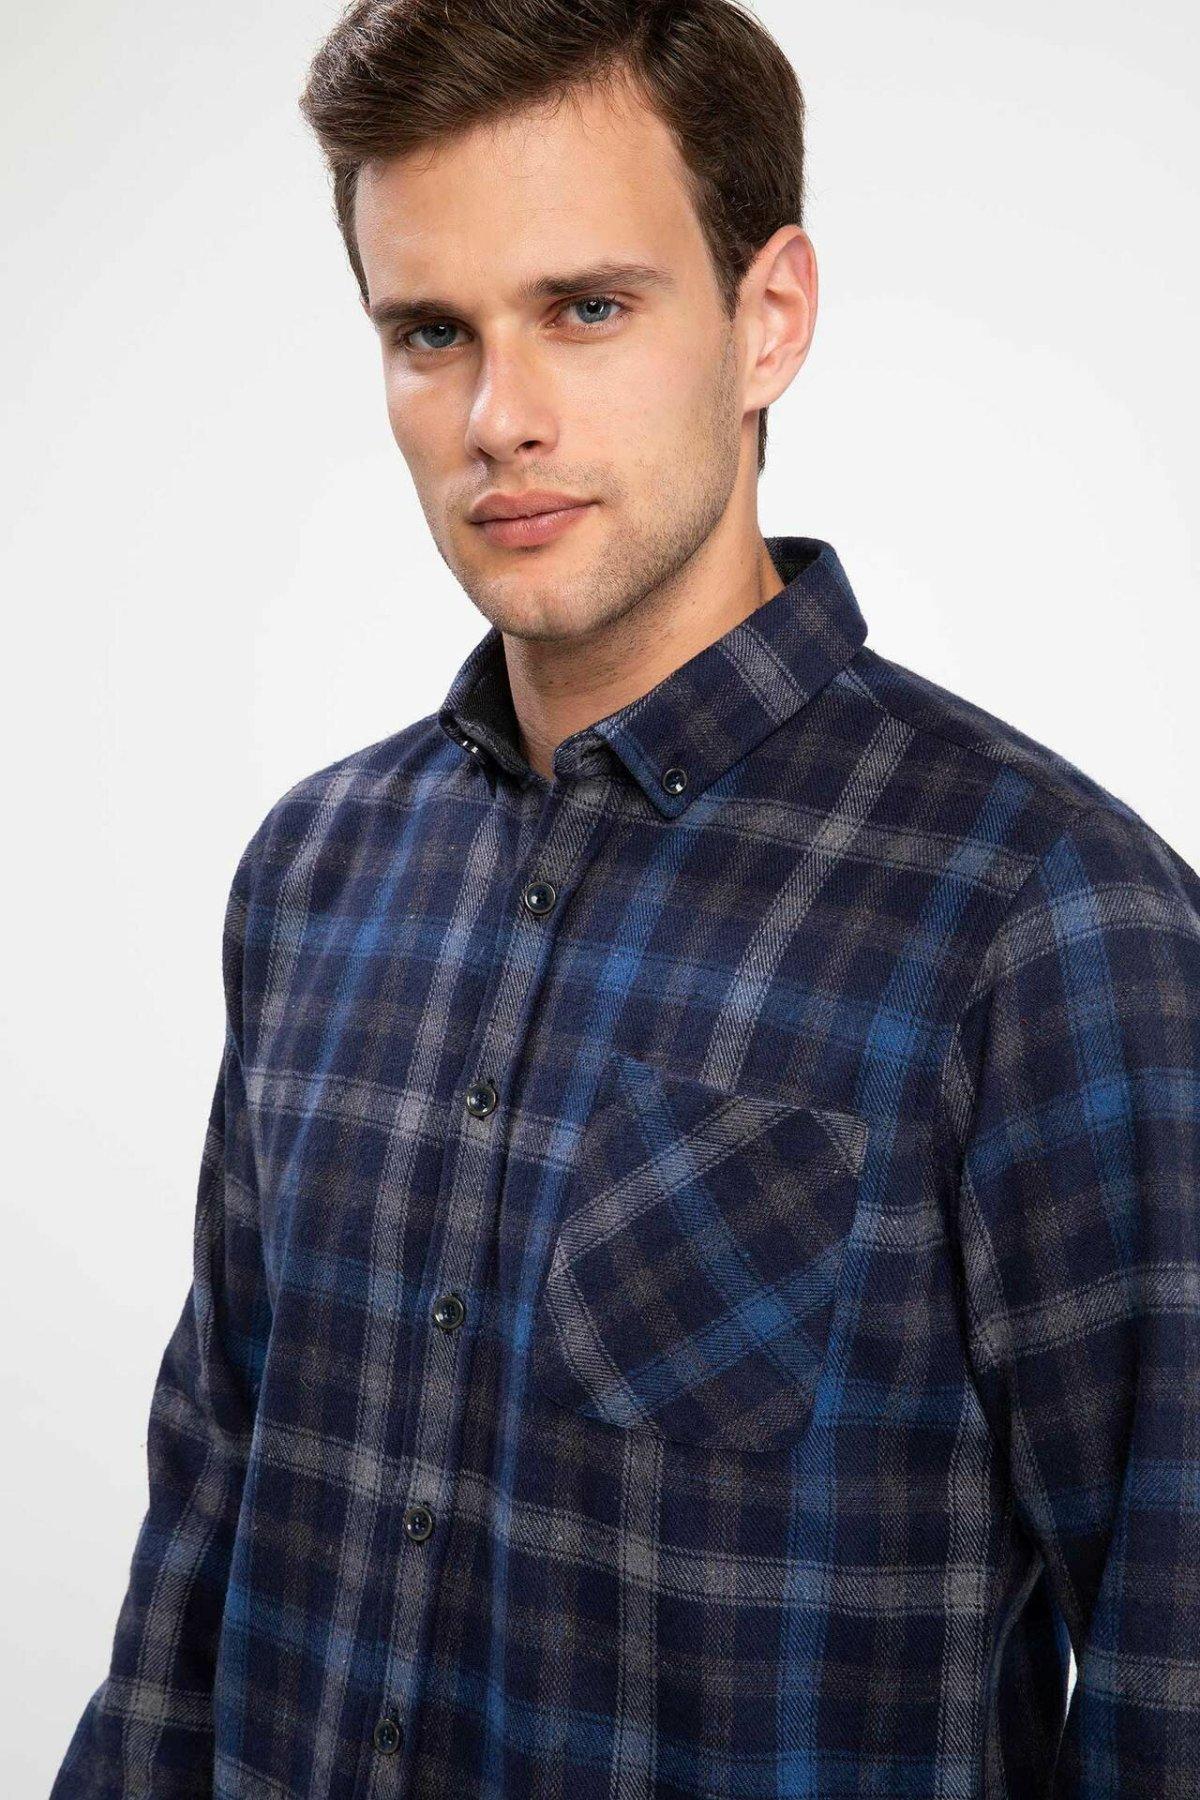 DeFacto Man Long Sleeve Plaid Shirt Men Autumn Dark Grid Top Shirts Pockets Turn-down Collar Male Casual Shirts-J1656AZ18WN